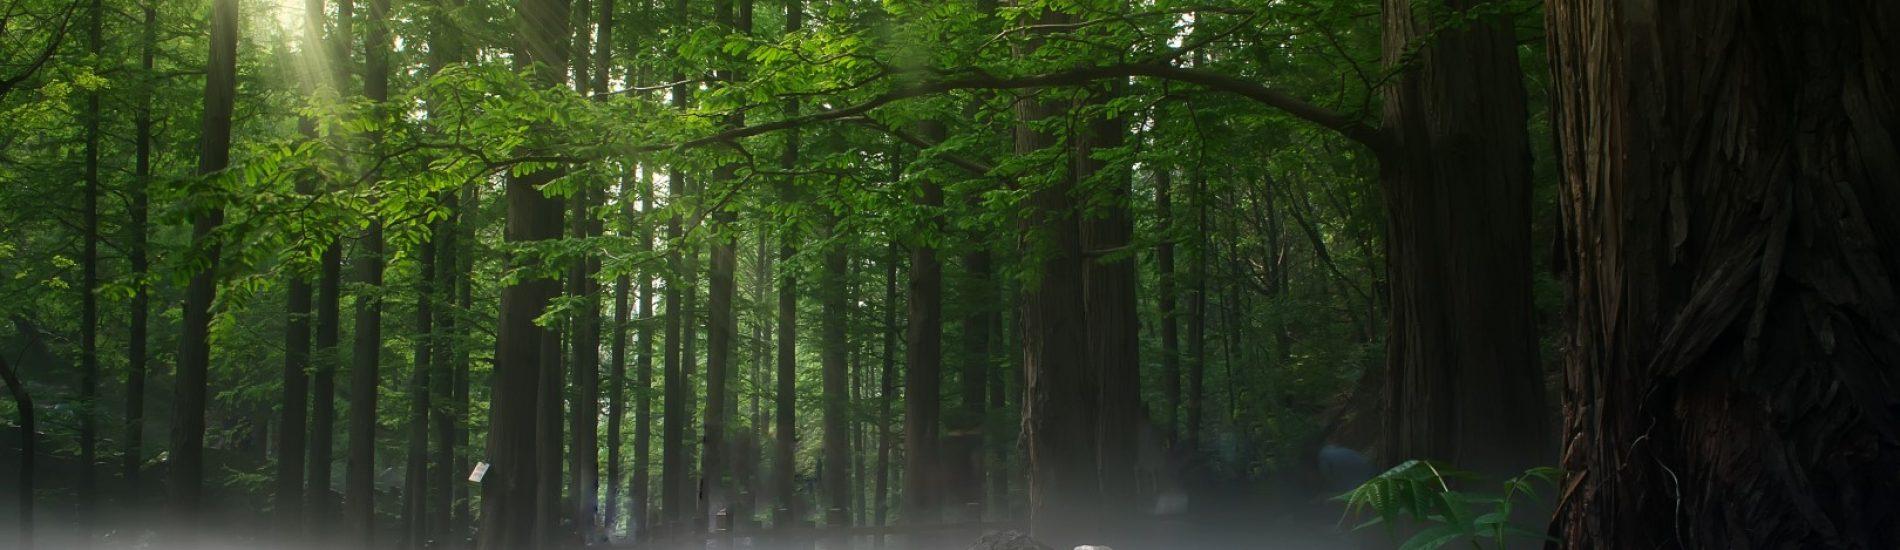 shinrin-yoku | bosbaden | helende natuur | 2